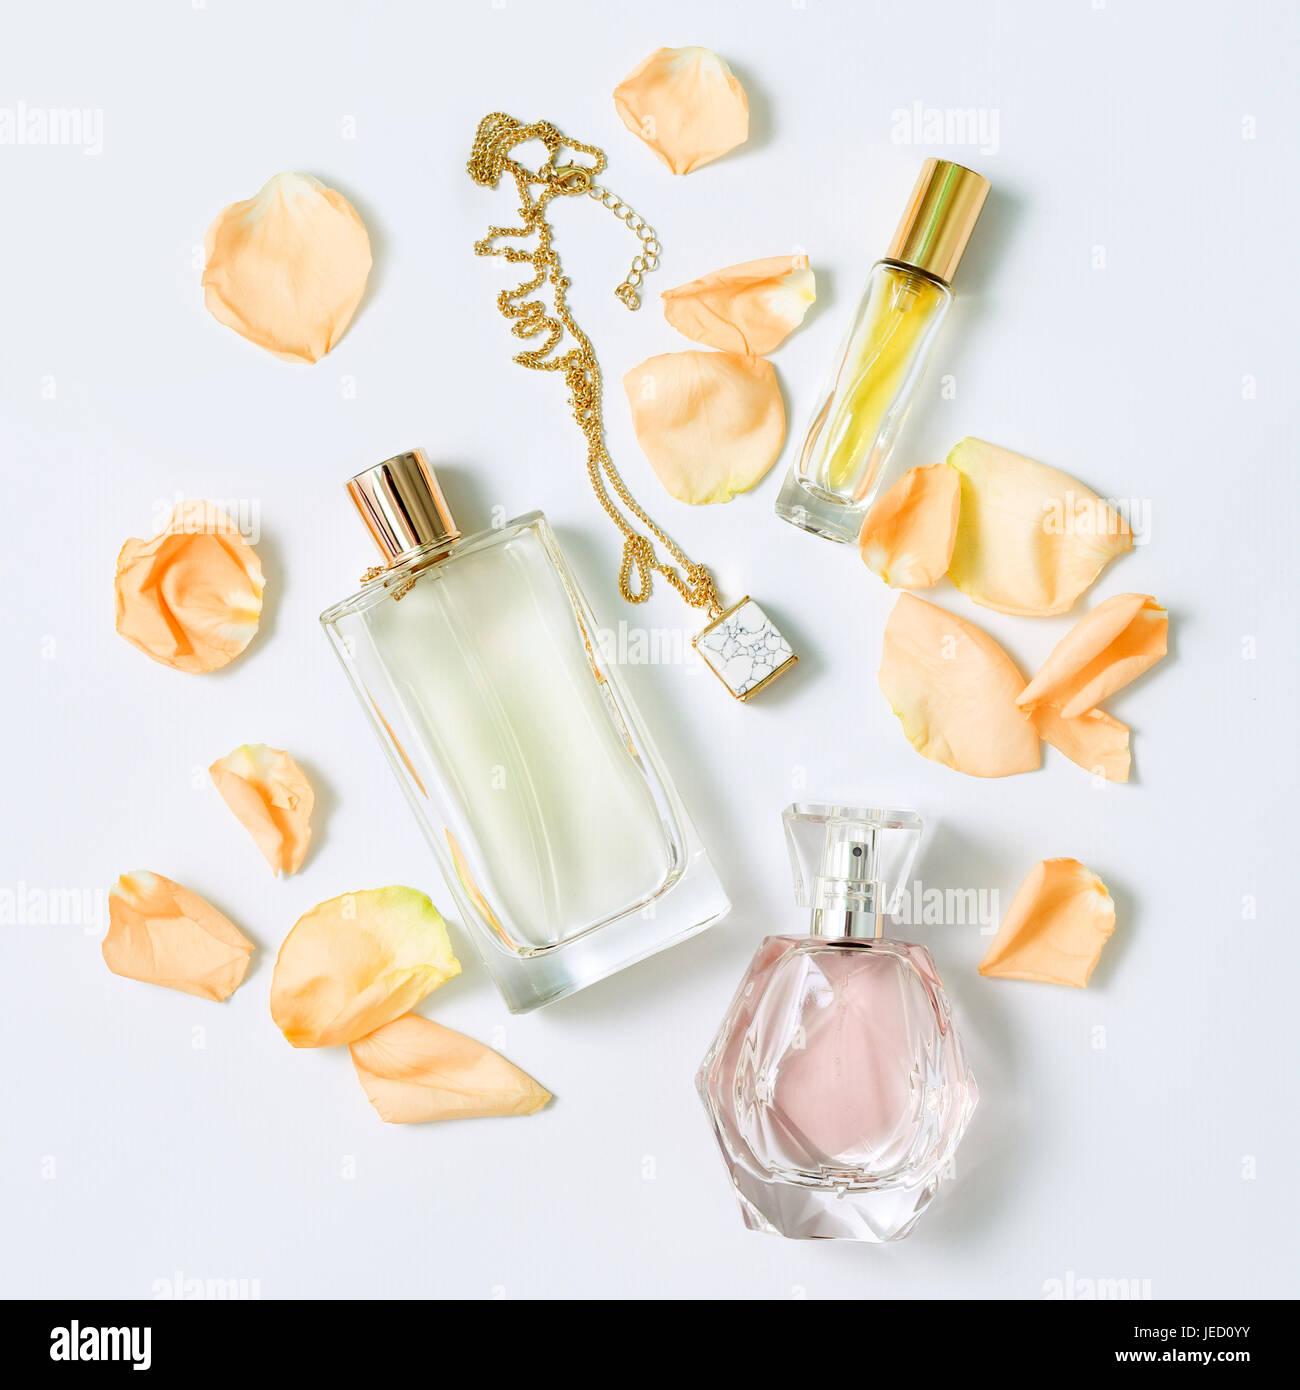 Perfume bottle flowers stock photos perfume bottle flowers stock perfume bottles with flowers petals on white background perfumery cosmetics jewelry and fragrance mightylinksfo